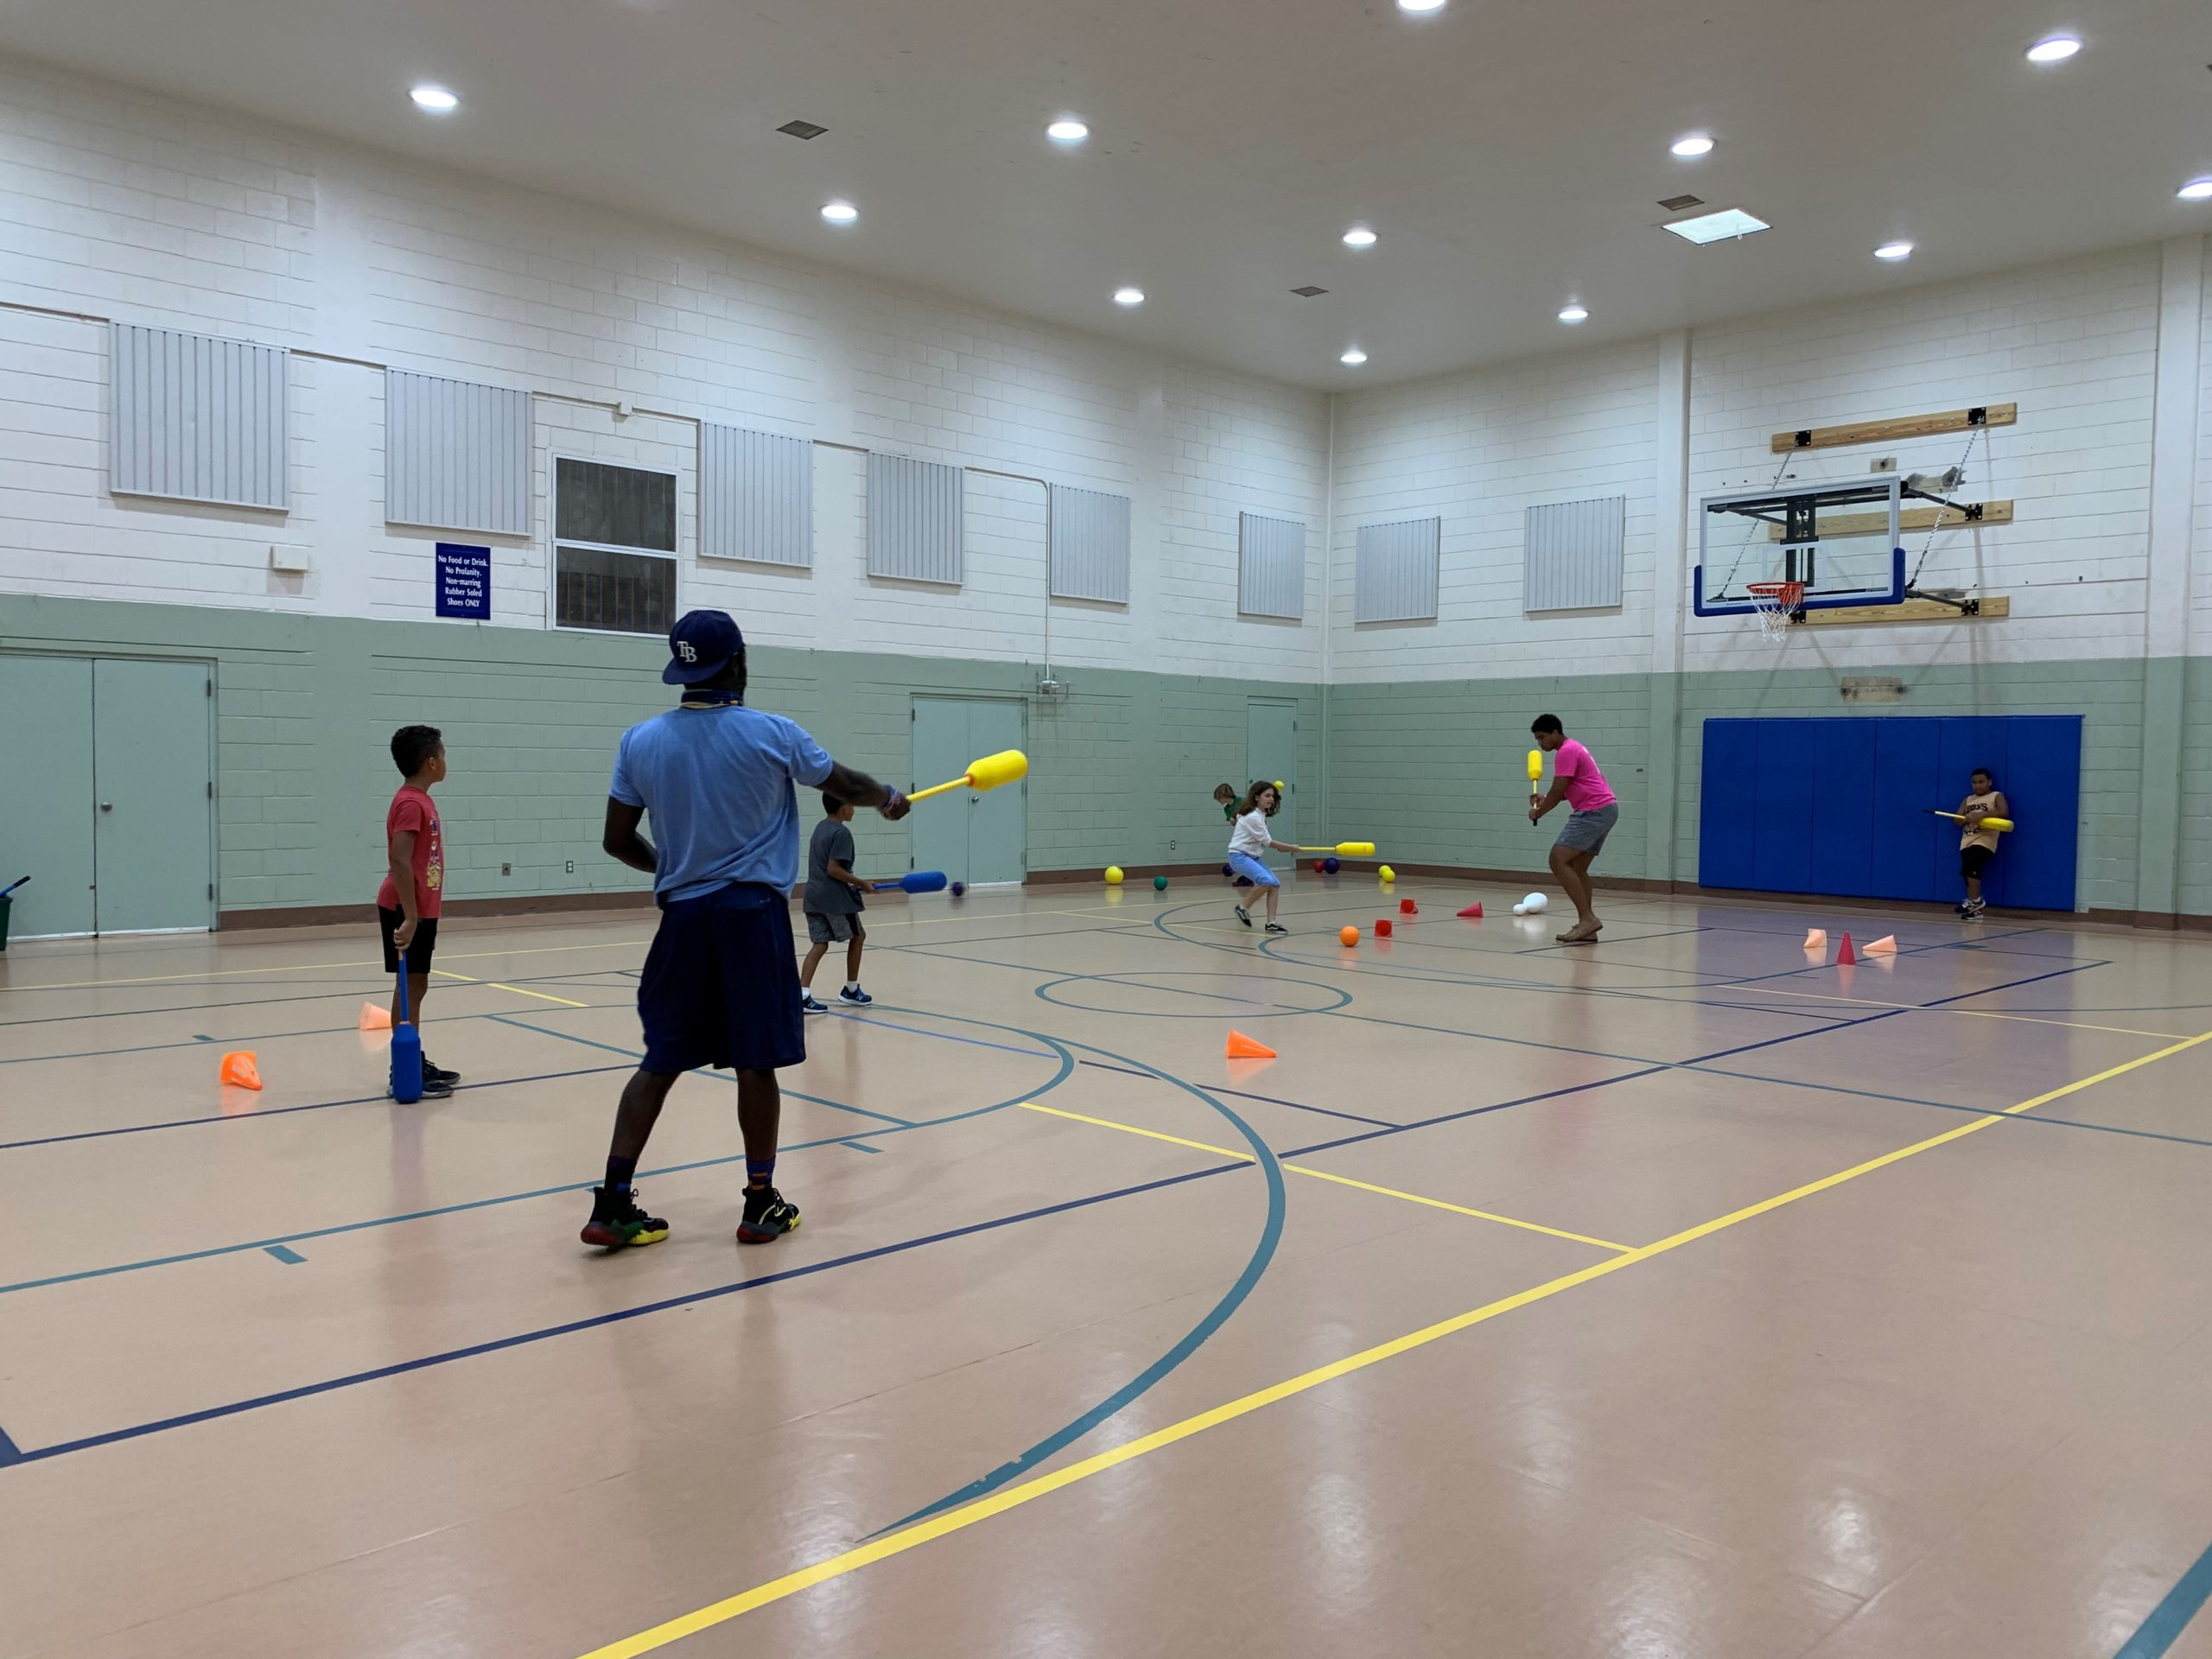 Kids play games indoor Gulfport Florida Rec center